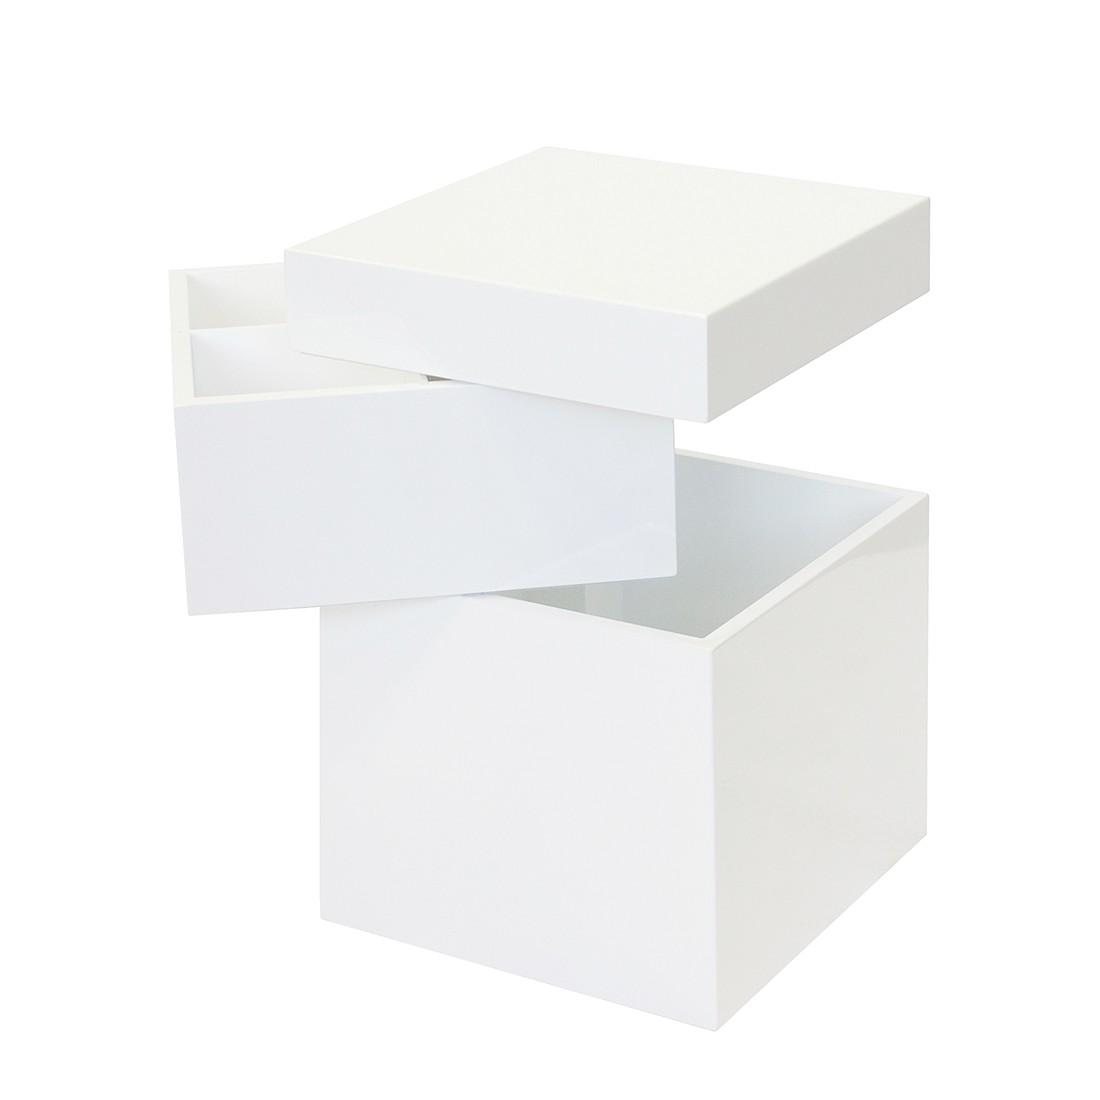 Torre-cassettiera Bloc I - Bianco, Tenzo